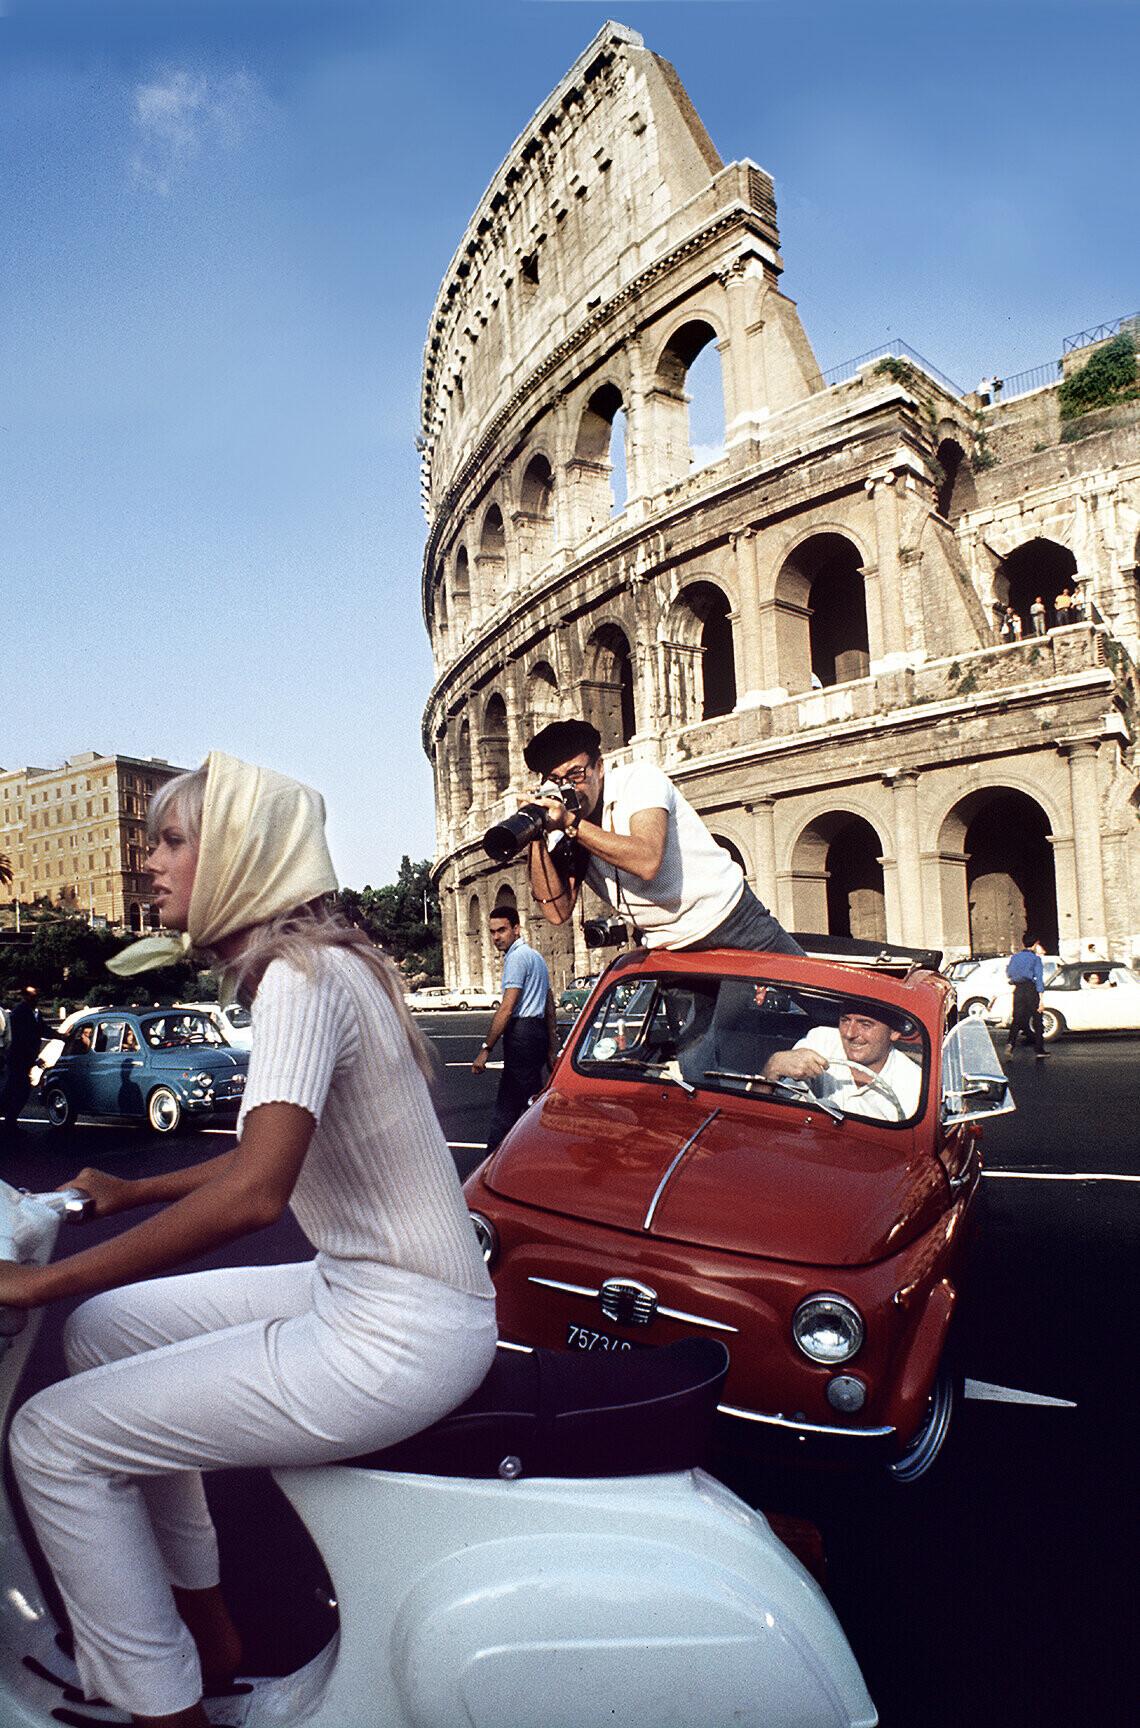 Погоня в стиле папарацци. Бритт Экланд и Питер Селлерс, Рим, август 1965 года. Фотограф Дуглас Киркланд